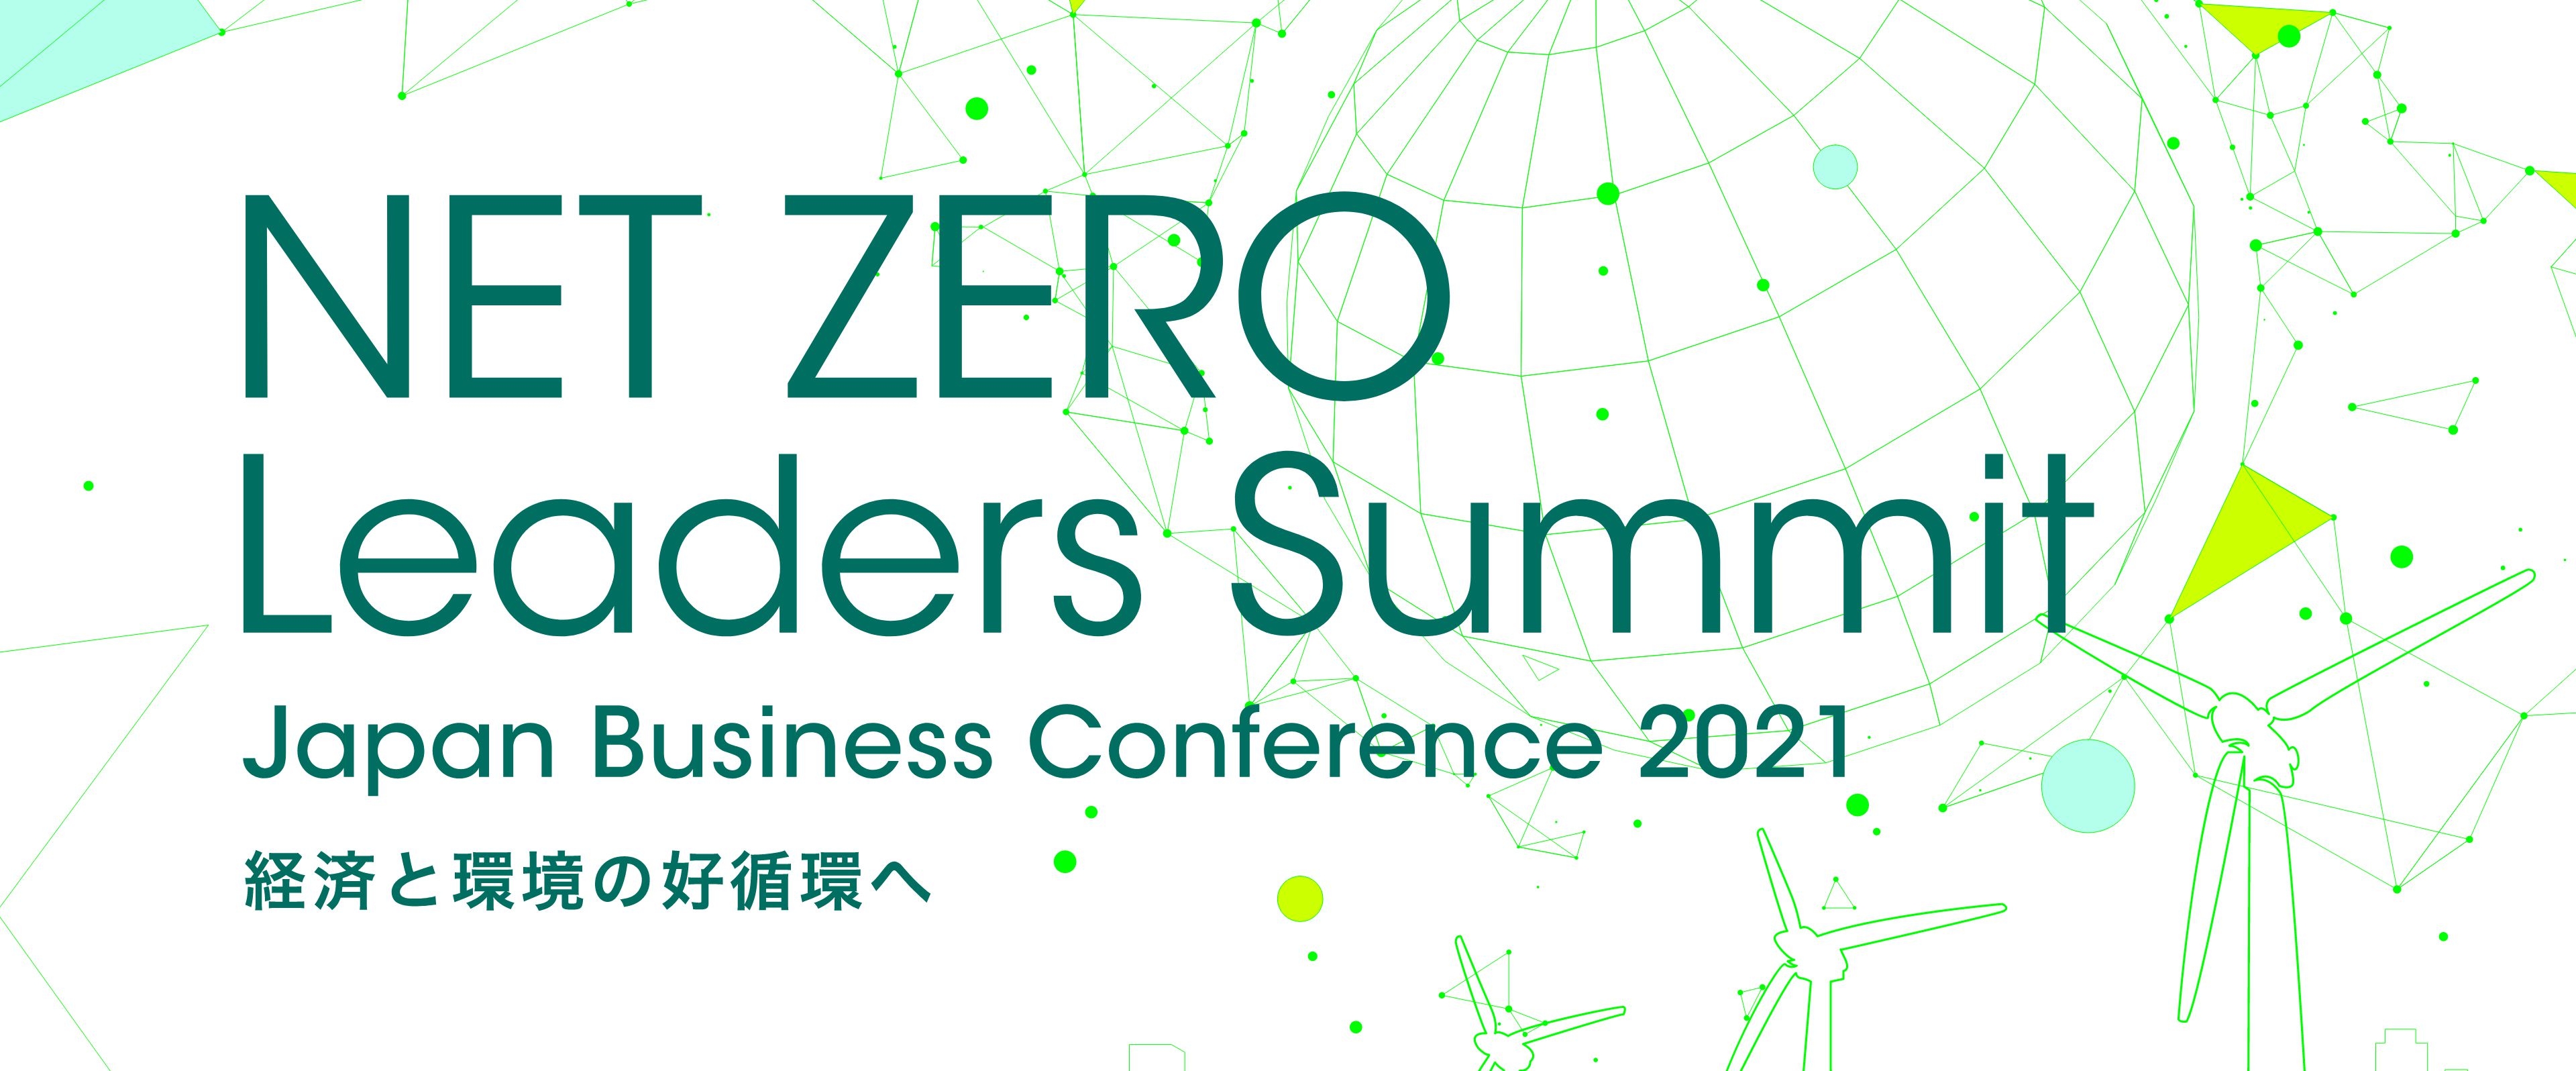 NET ZERO Leaders Summit Japan Business Conference 2021 経済と環境の好循環へ